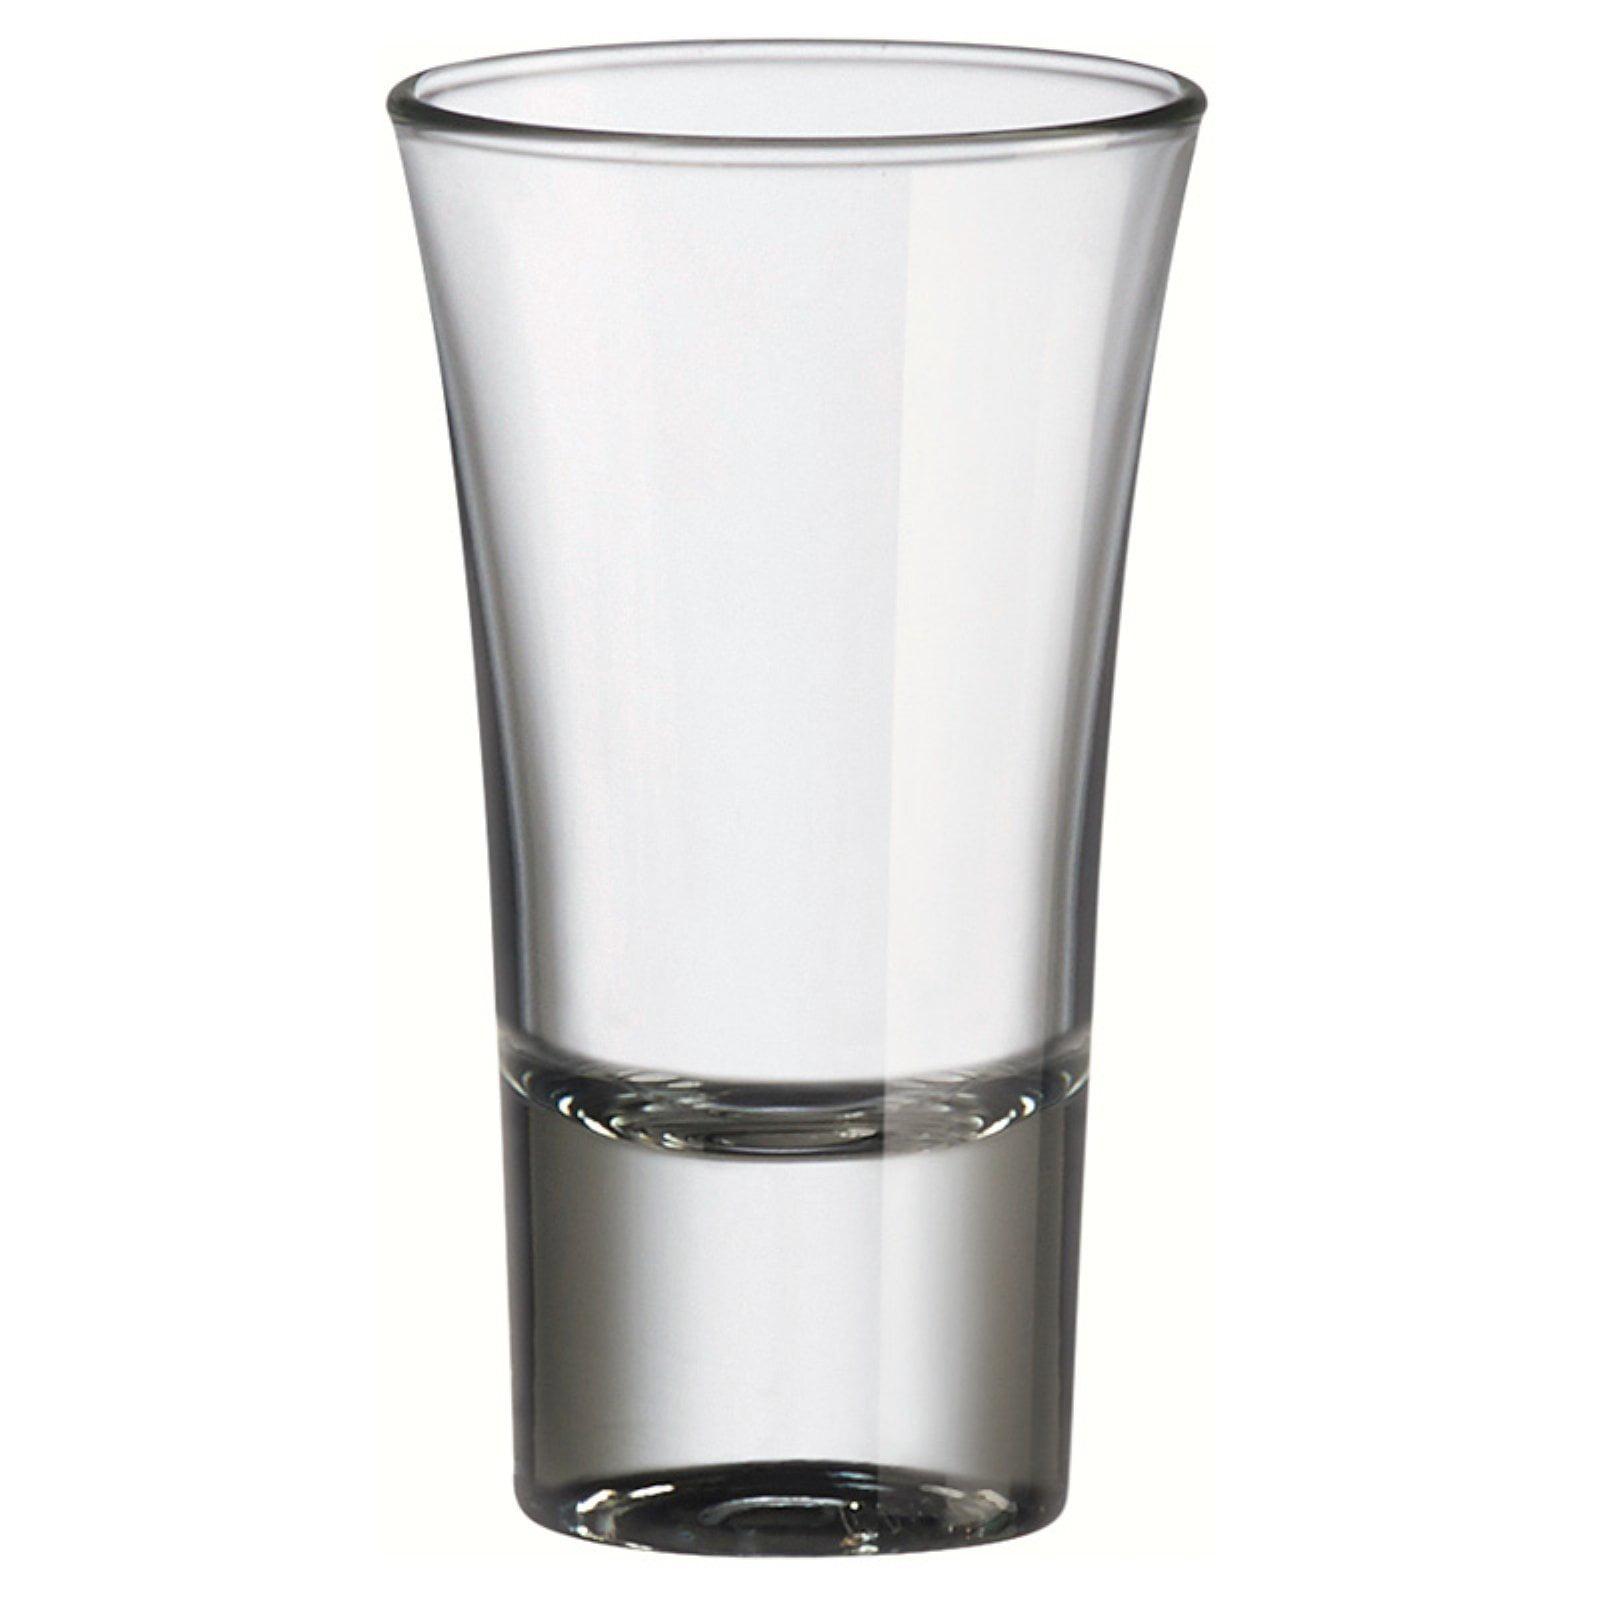 Bartender's Choice Jigger Shot Glass, Set of 6, 2 oz by Global Amici